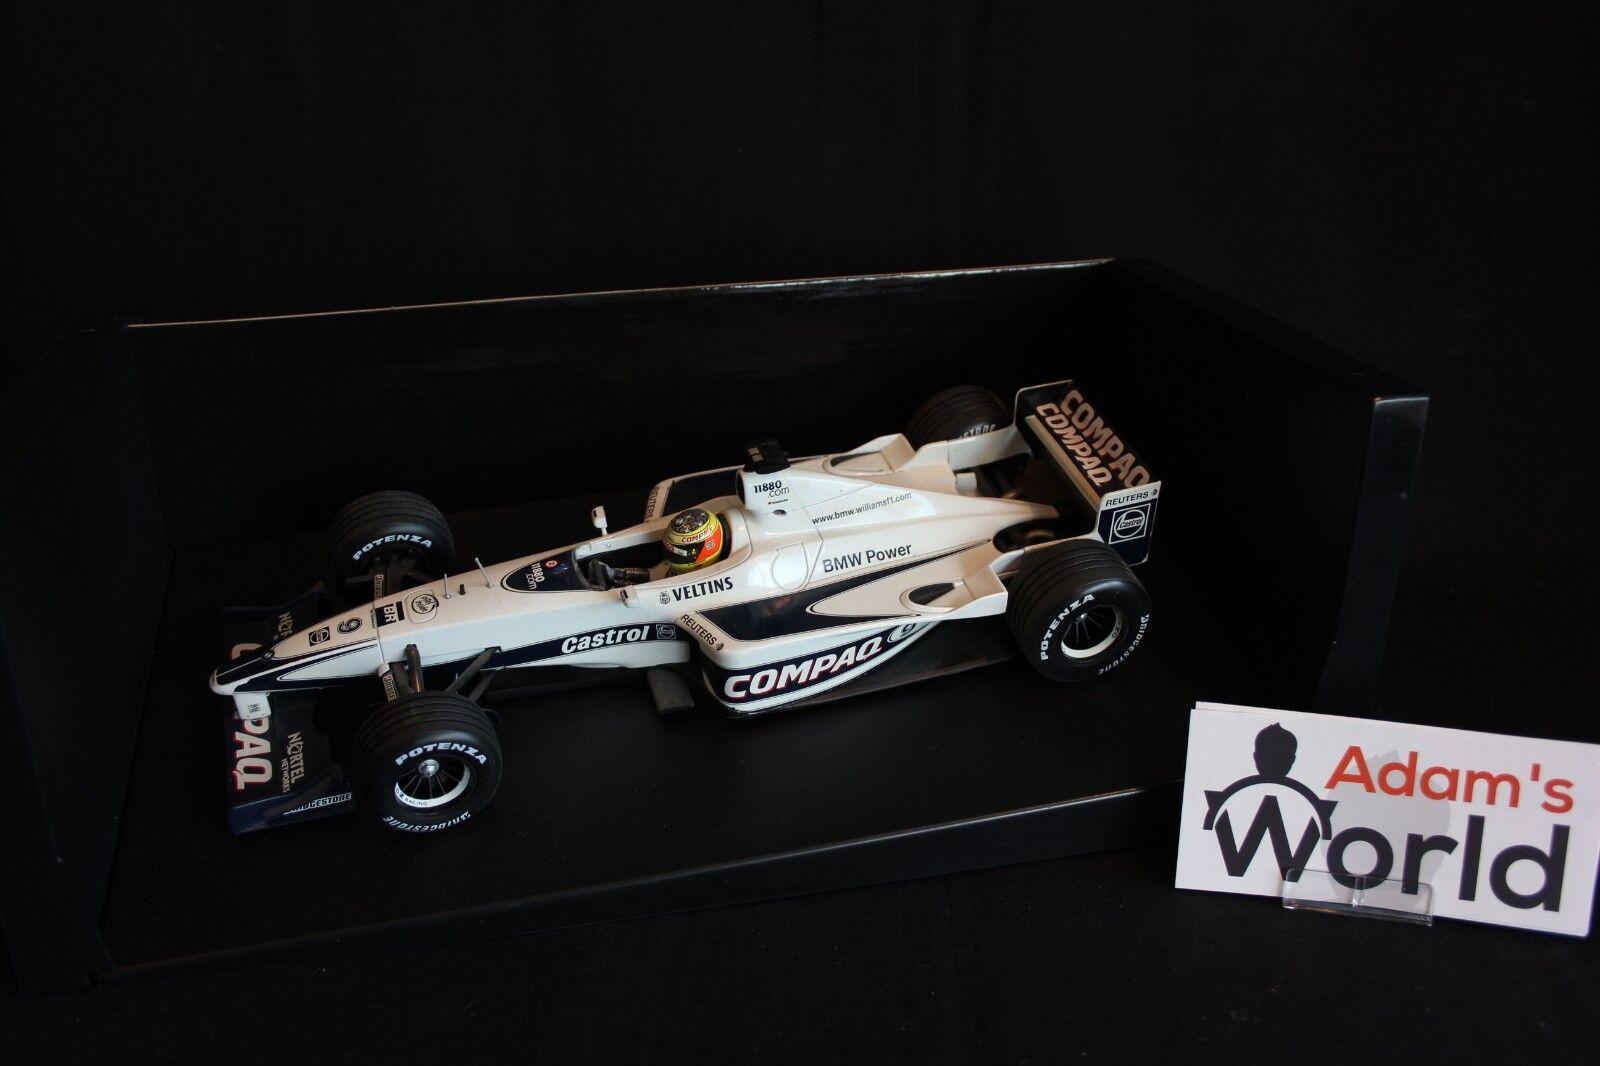 Minichamps Williams BMW BMW BMW FW22 2000 1 18  9 Ralf Schumacher (GER) 7ddfef